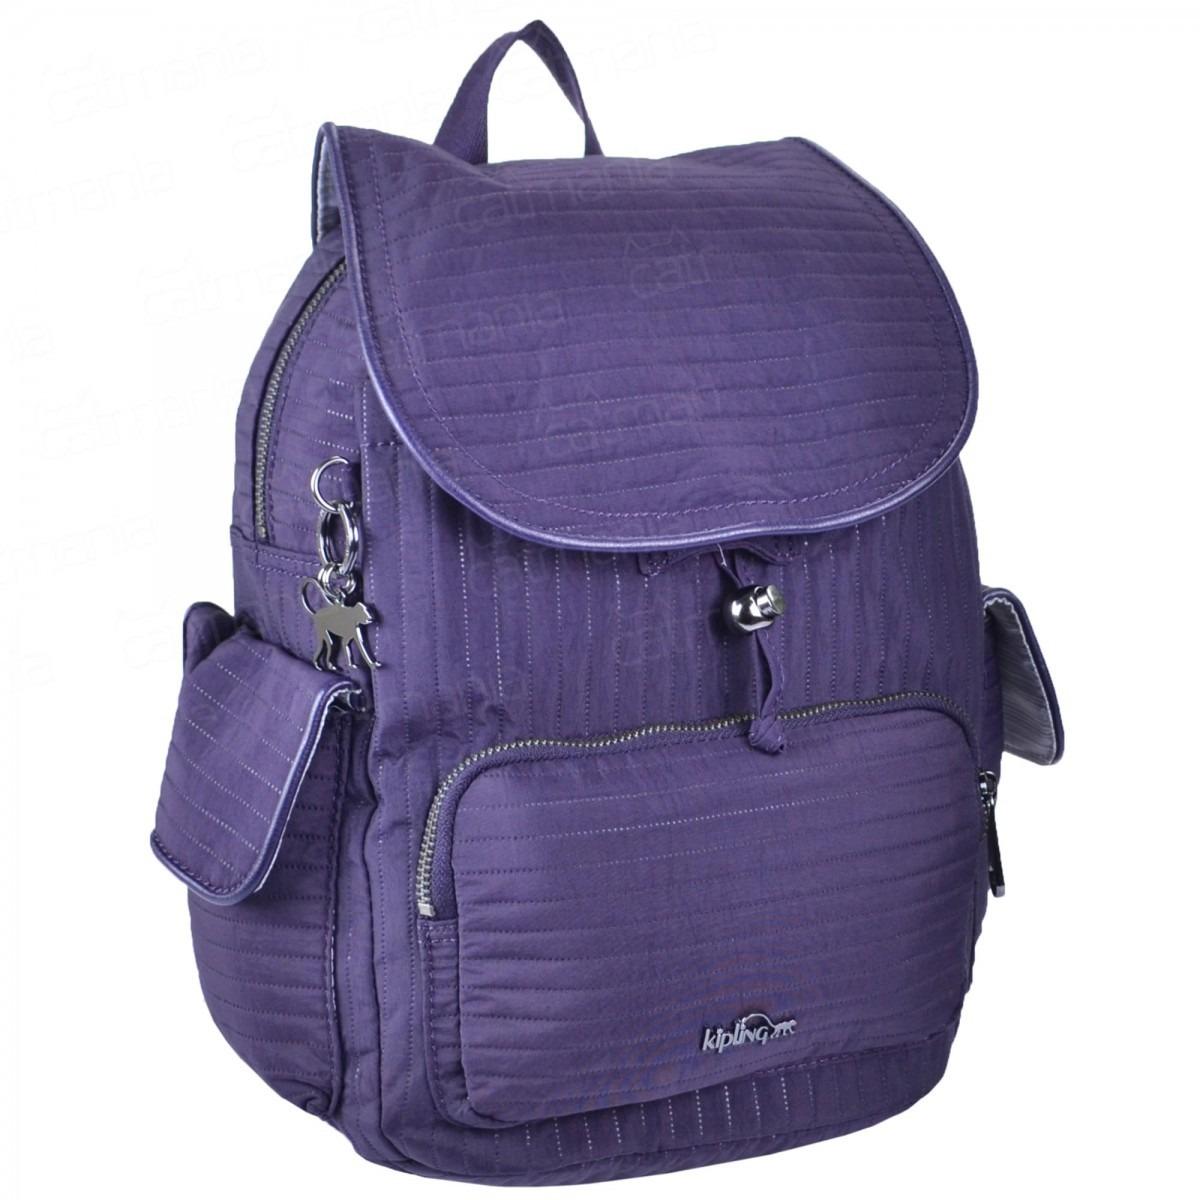 f845627f6 Mochila Feminina Kipling City Pack S - R$ 579,00 em Mercado Livre